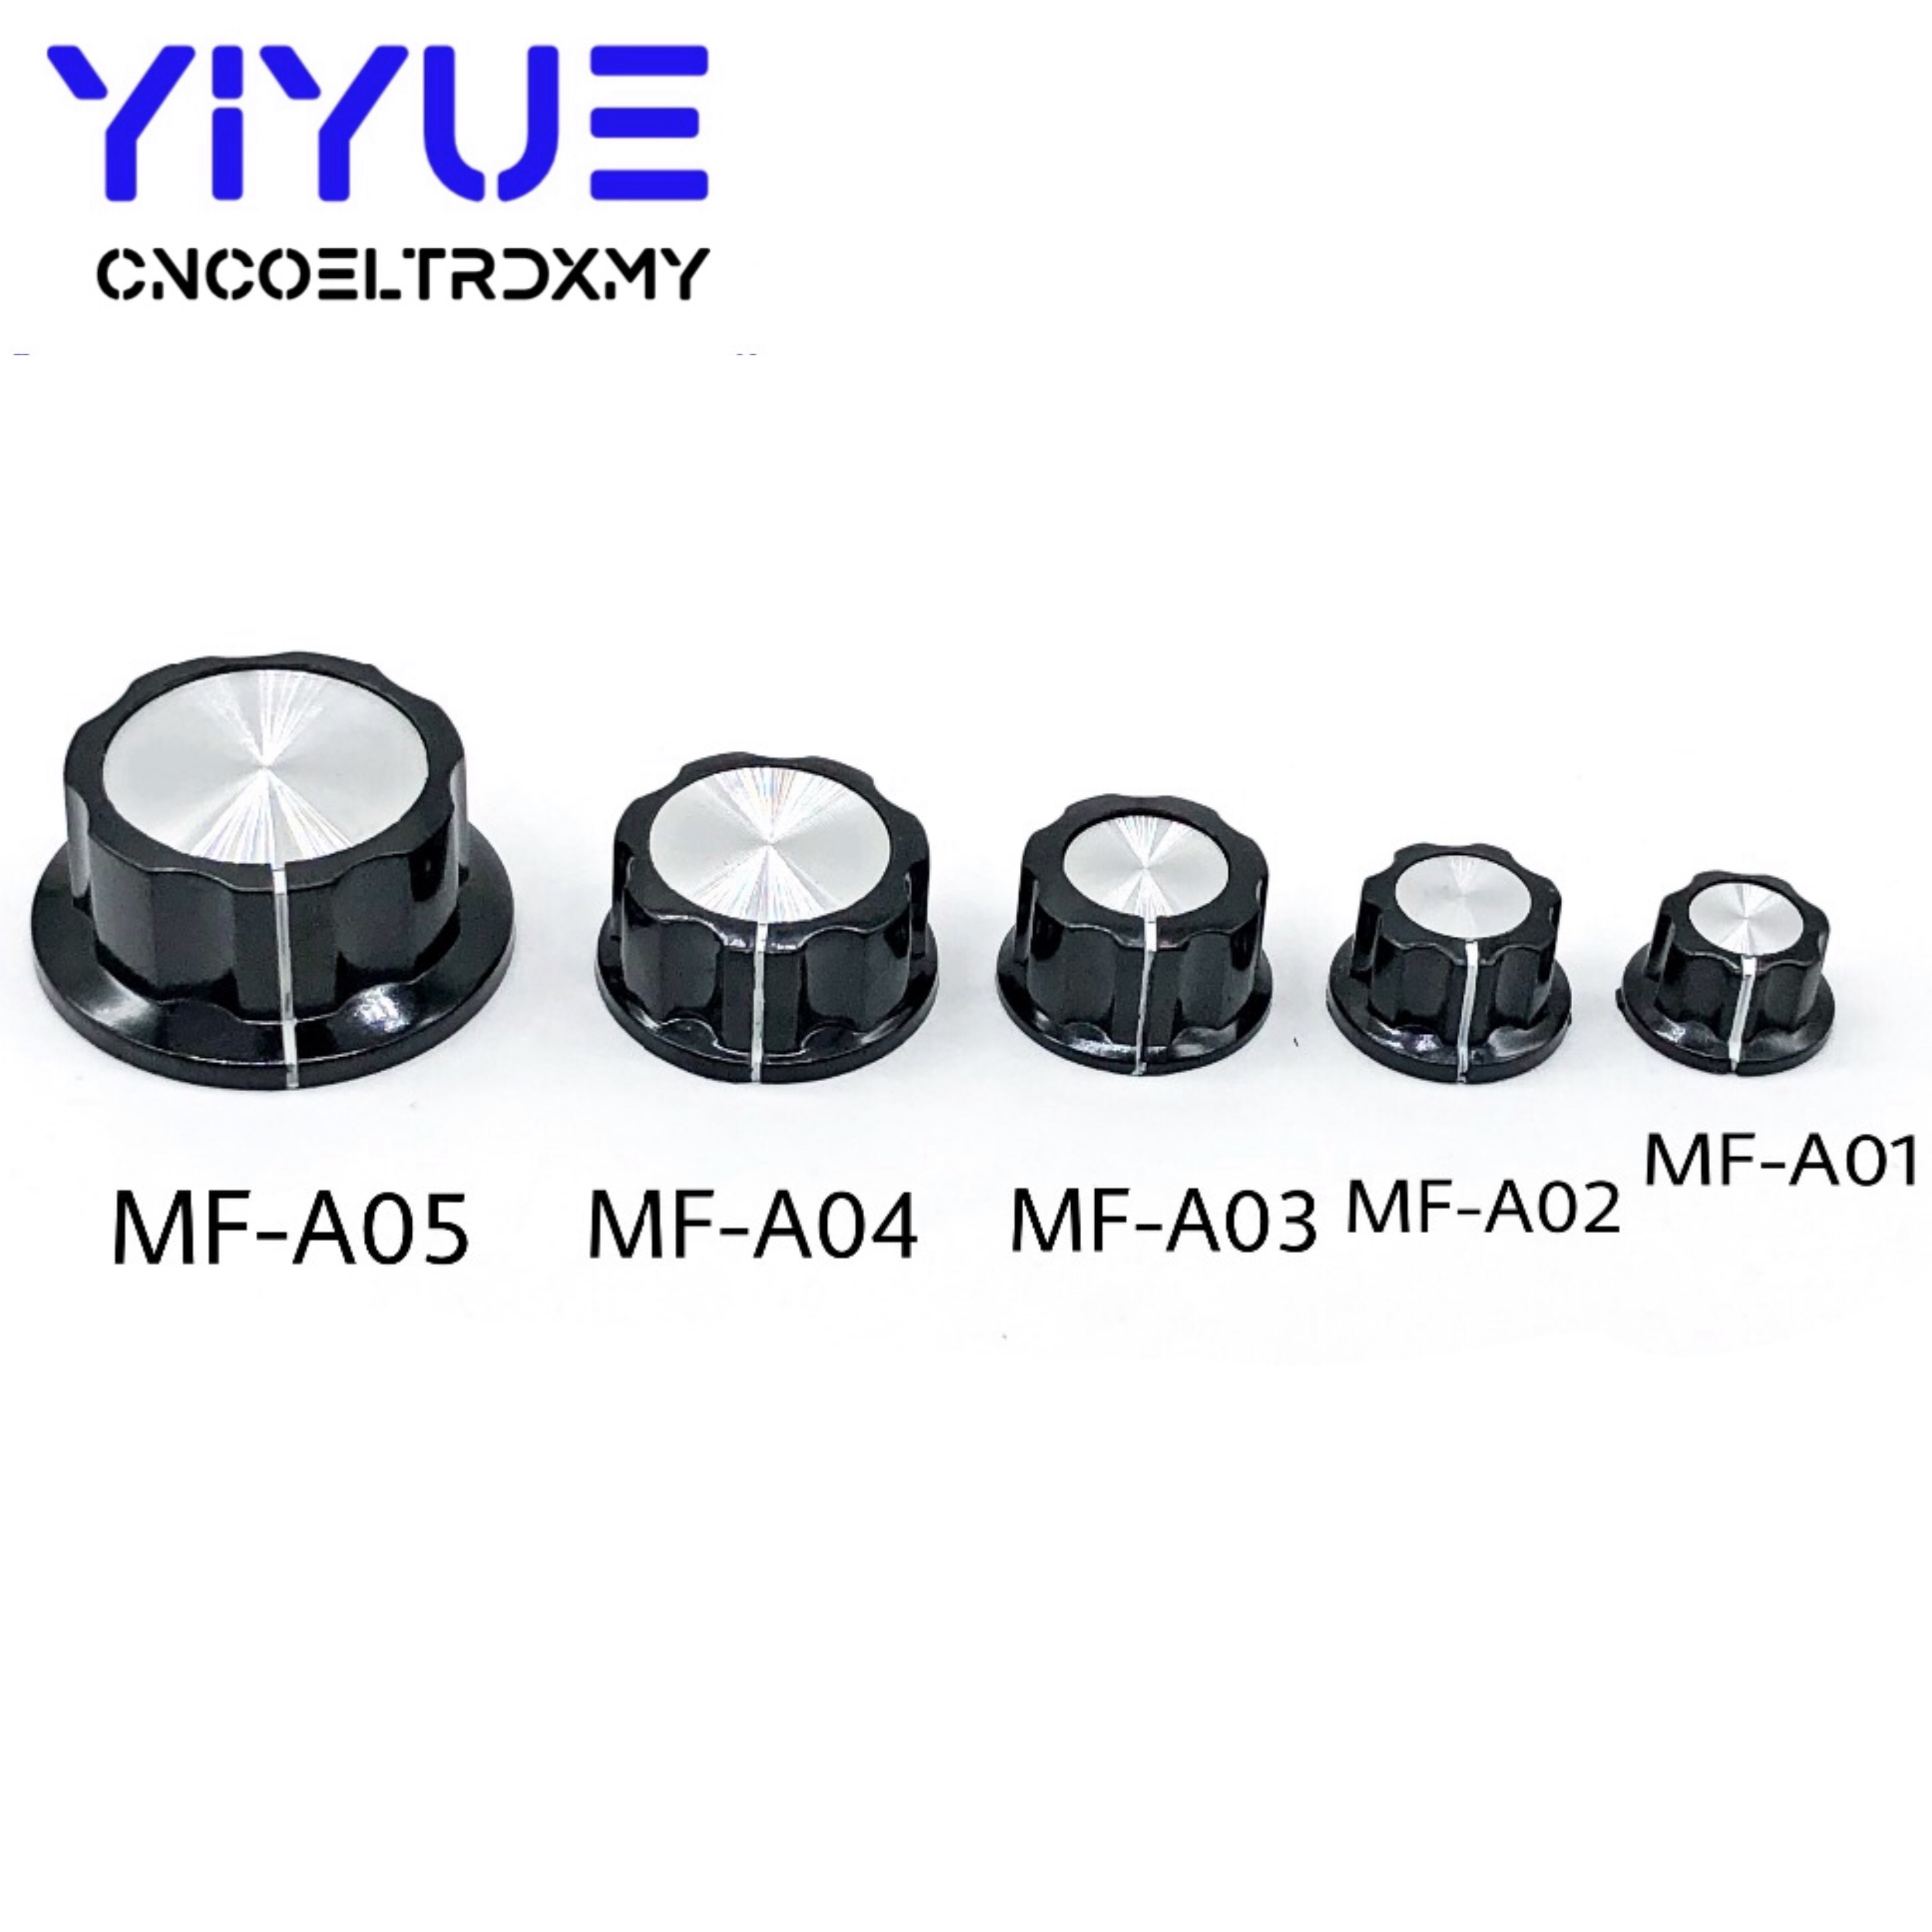 2Pcs Potentiometer Knob Cap 6mm Hole MF-A01 MF-A02 MF-A03 MF-A04 MF-A05 Rotary Switch Knobs Caps WHT118 WX050